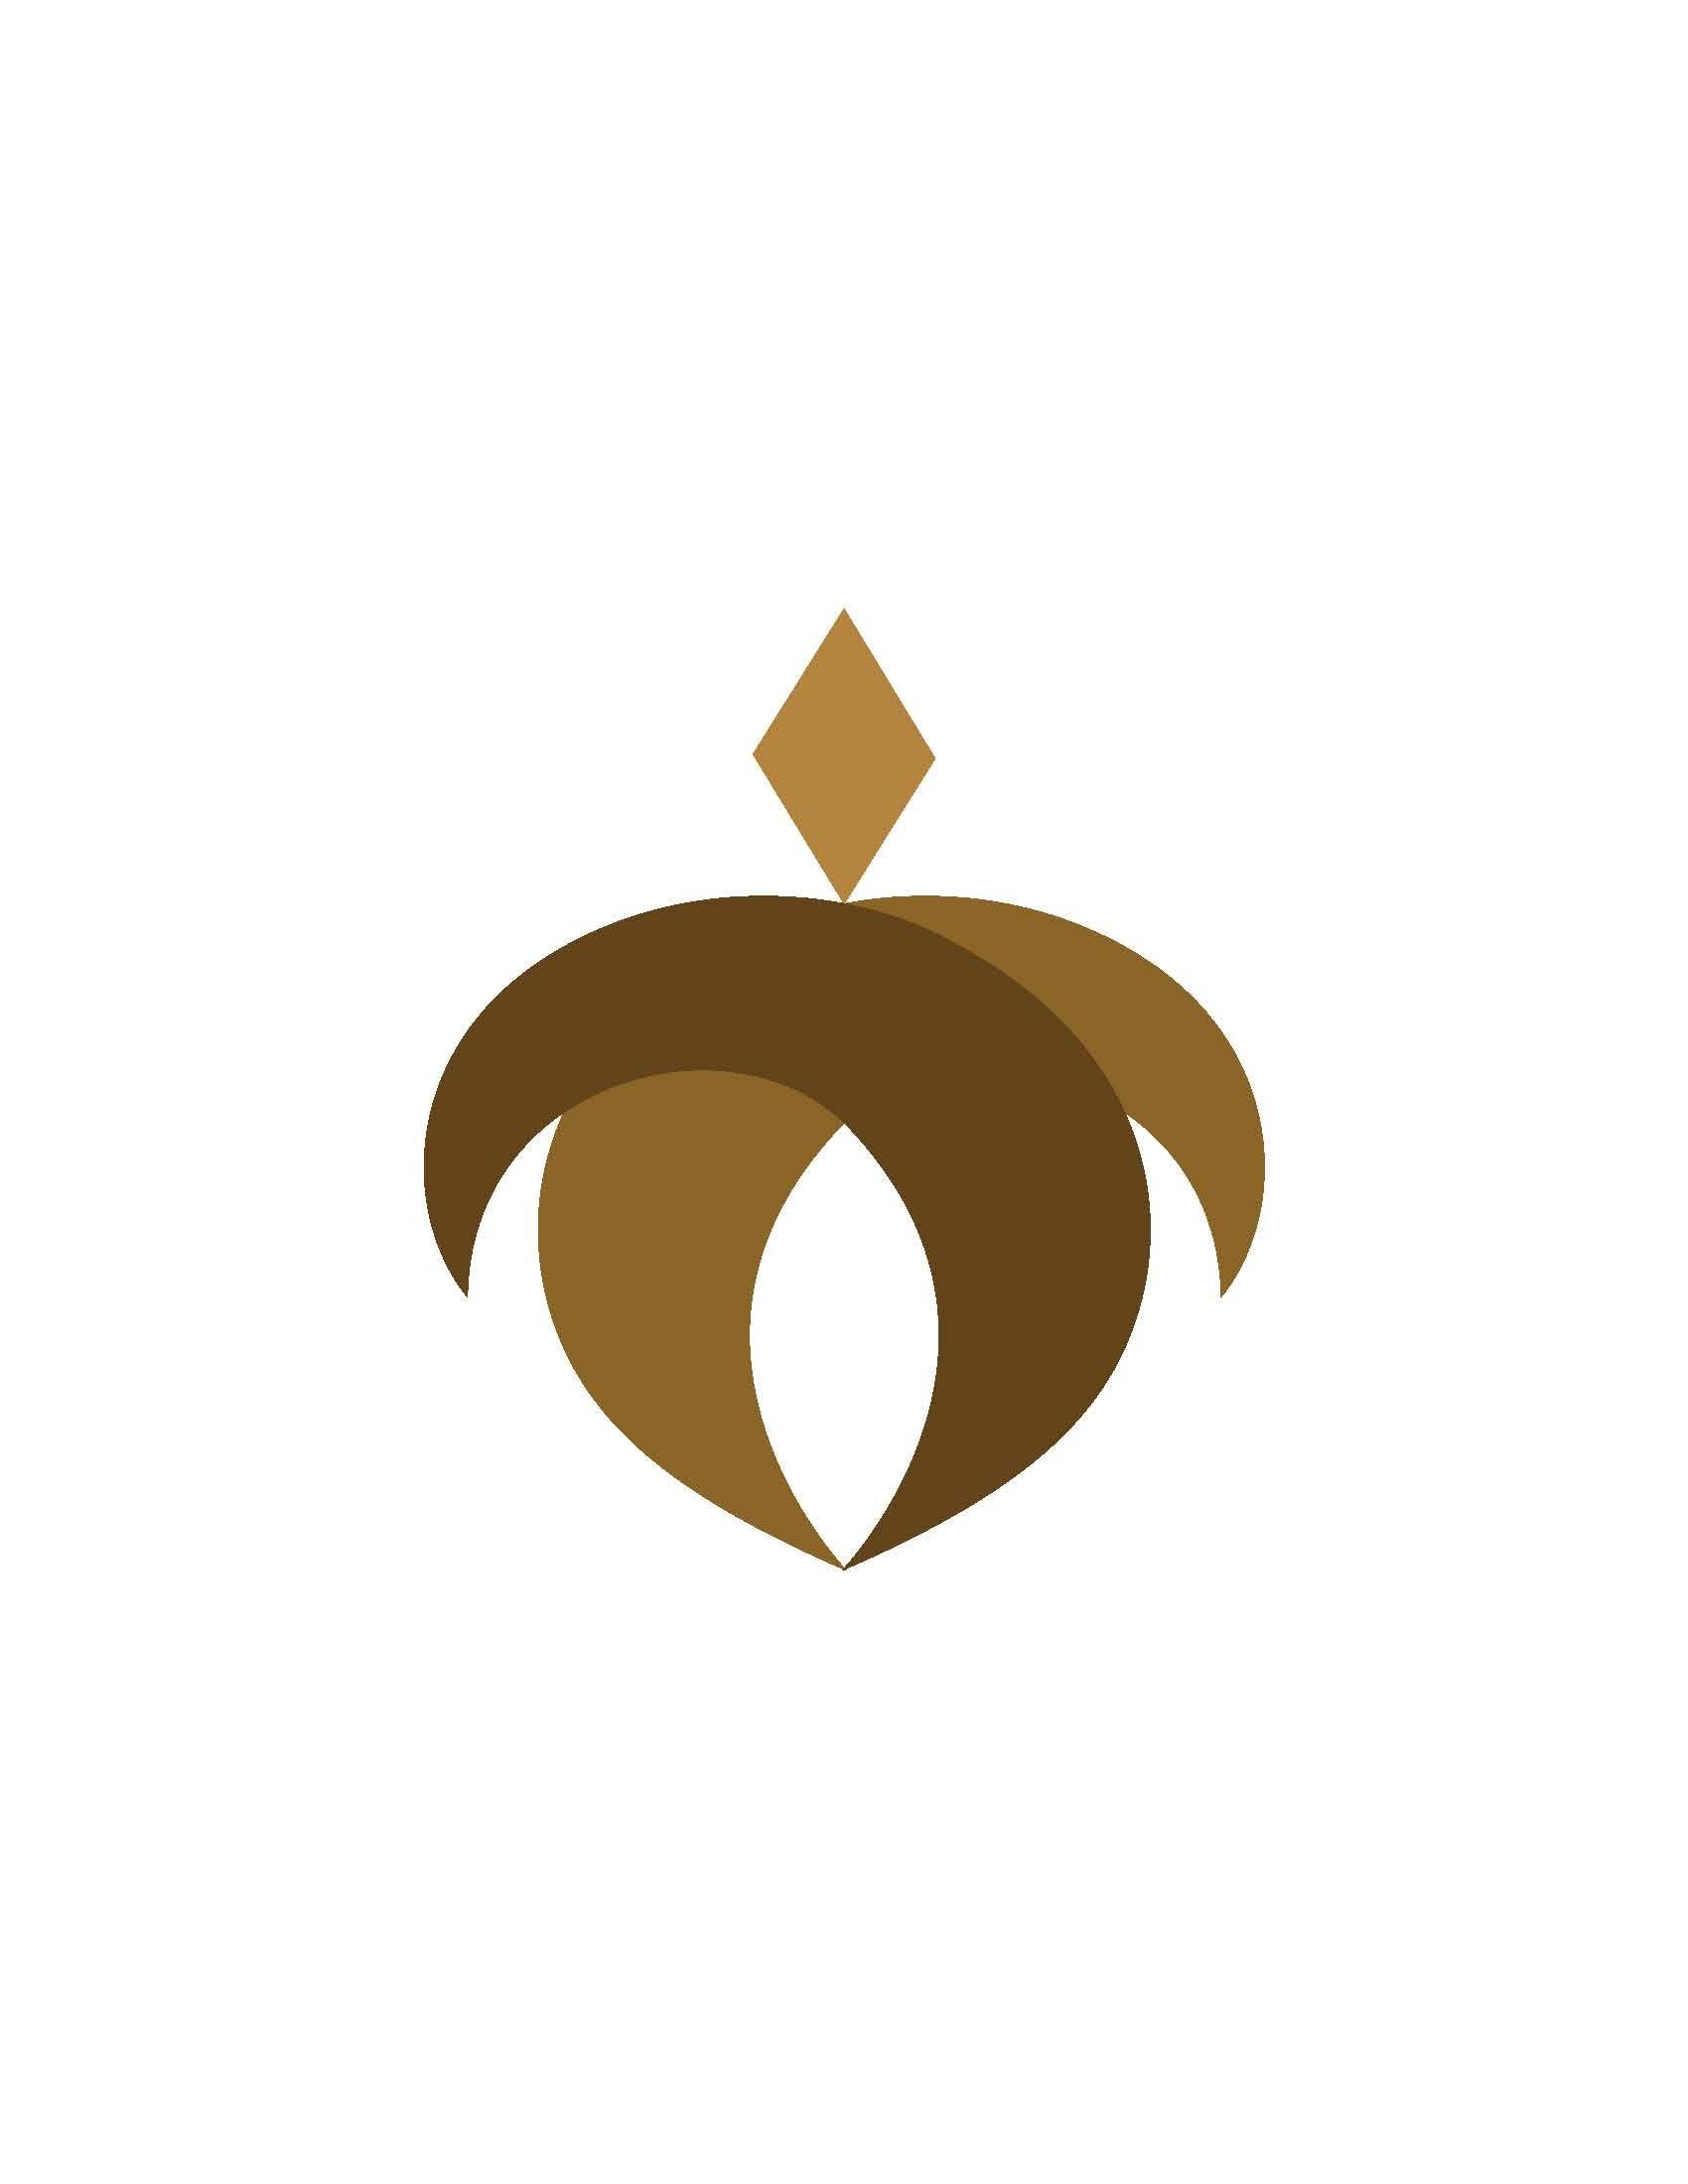 Celtic Symbols Of Creativity Google Search Kates Life Mandalas